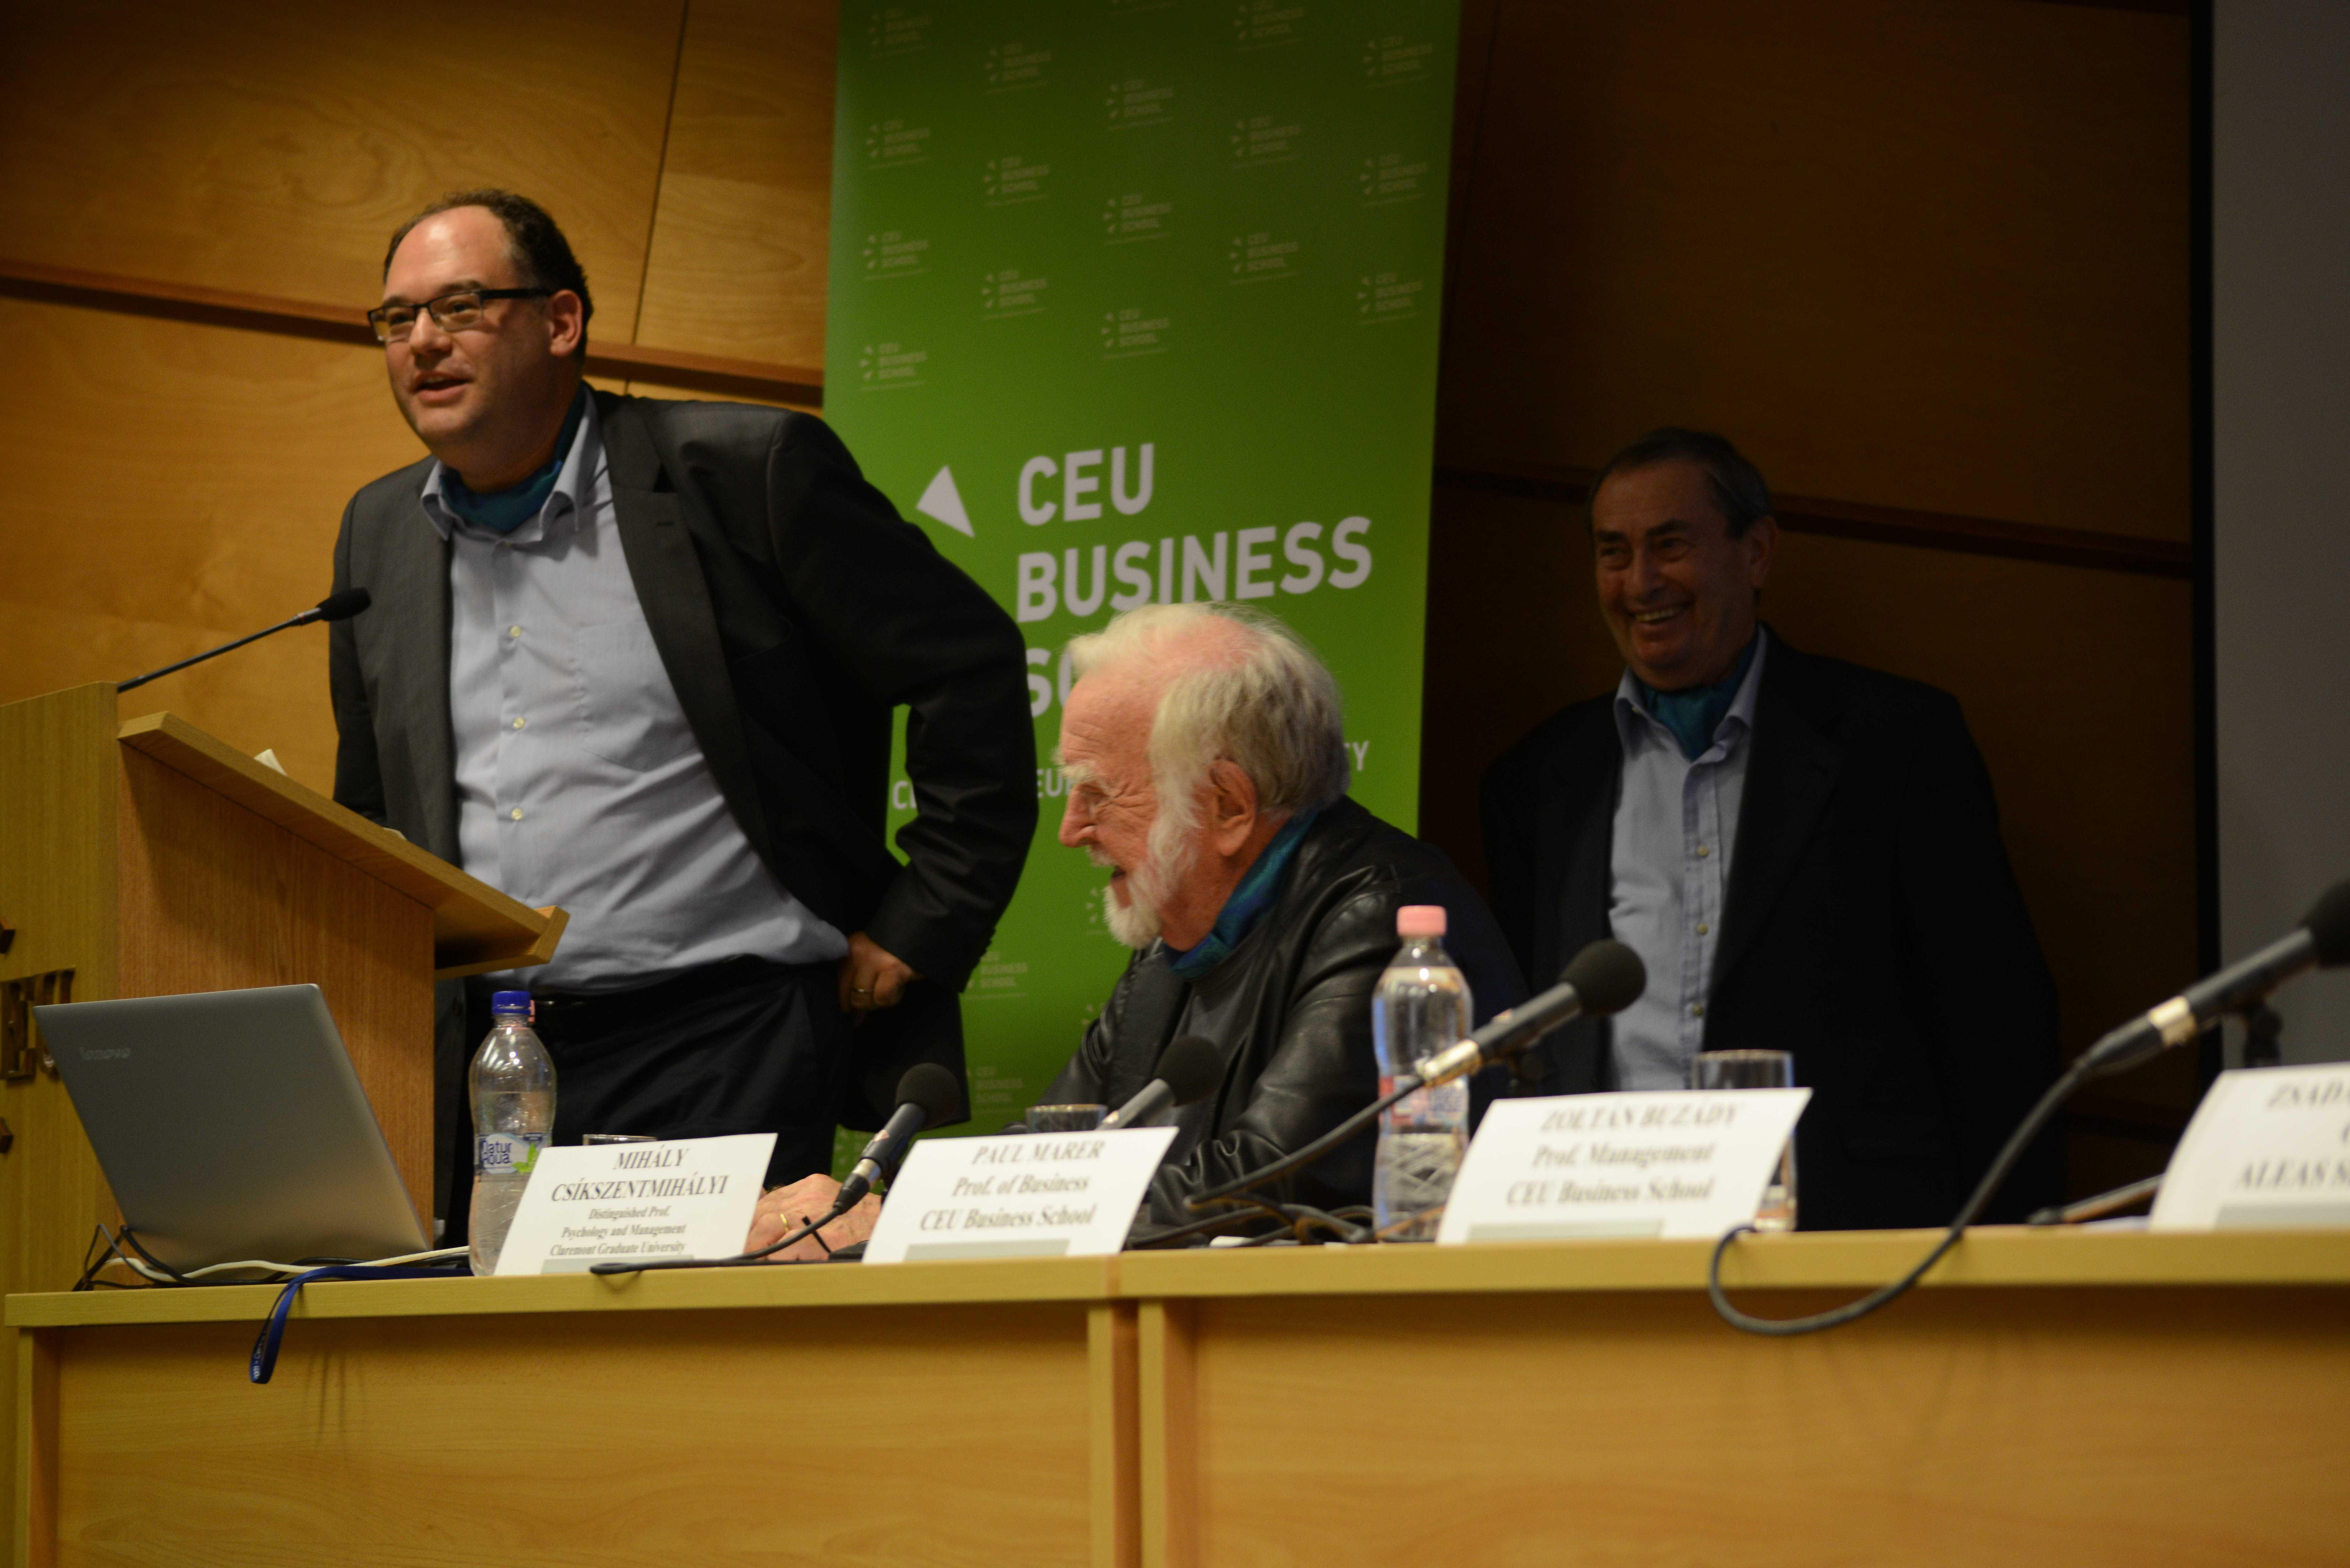 Zoltan Buzady, faculty member at CEU Business School, with Mihalyi Csikszentmihalyi and Professor Paul Marer (background) of CEU Business School. Photo: Edina Ligeti.